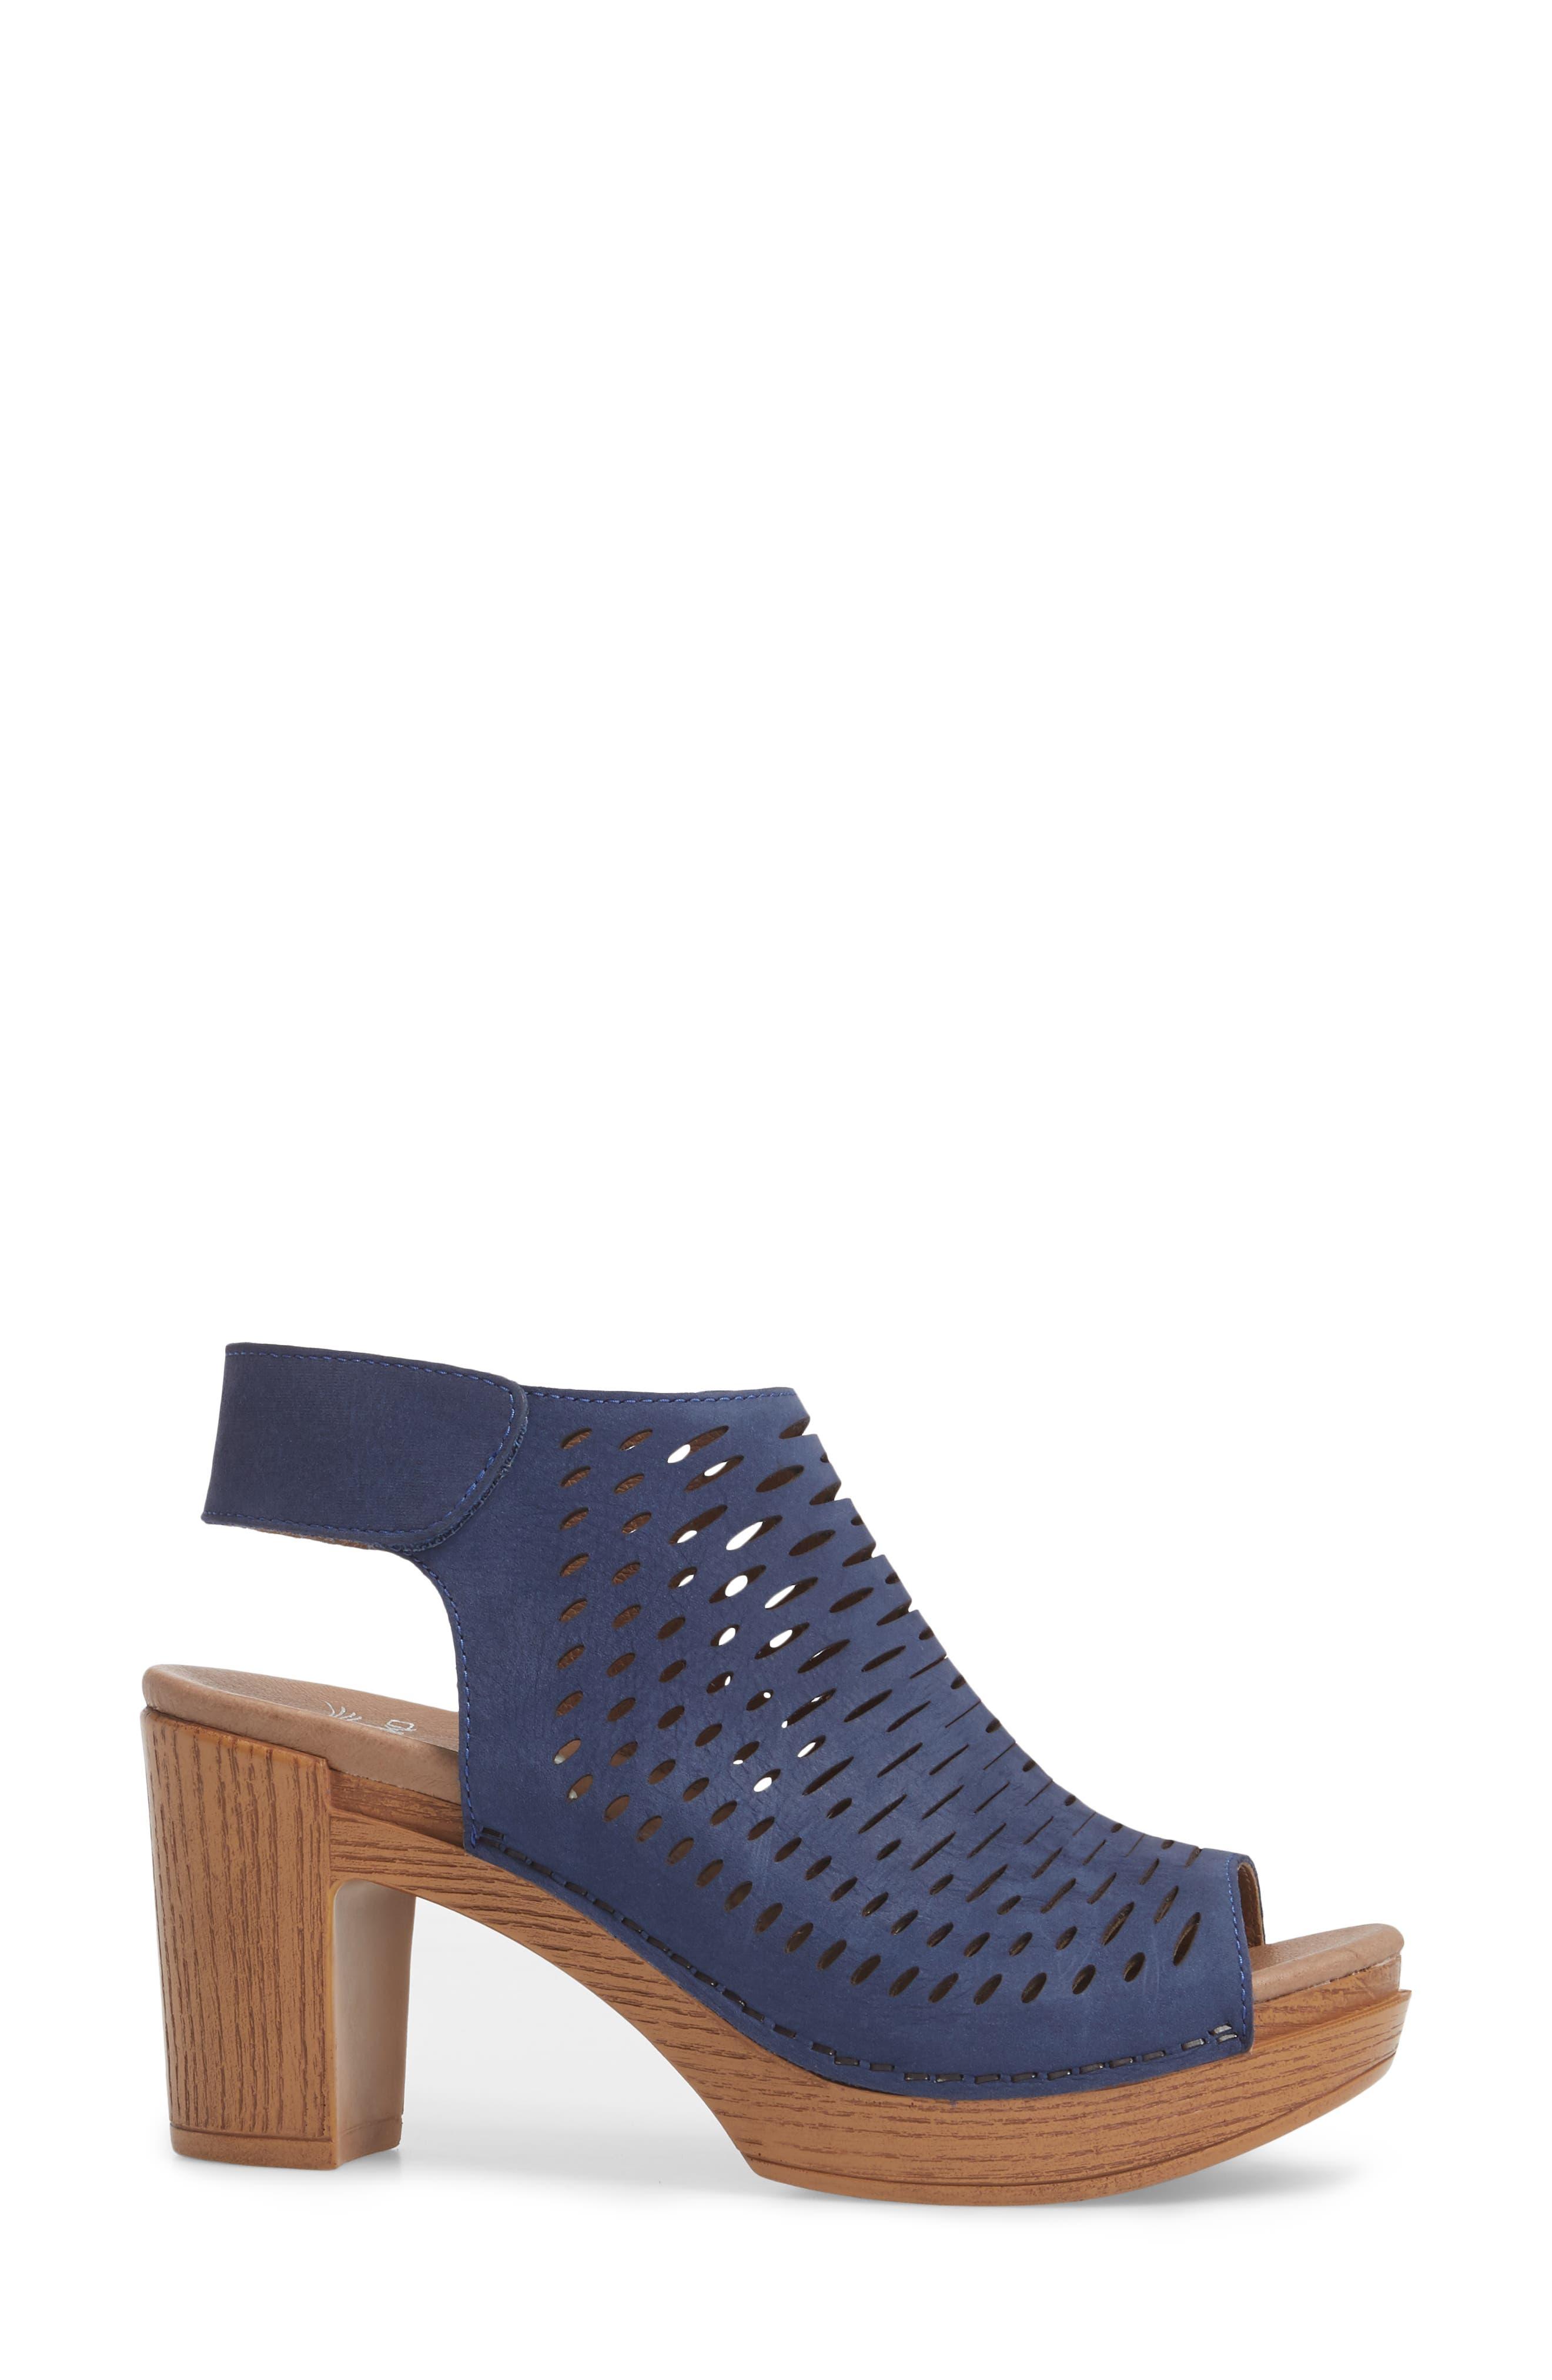 Danae Block Heel Sandal,                             Alternate thumbnail 3, color,                             Blue Milled Nubuck Leather